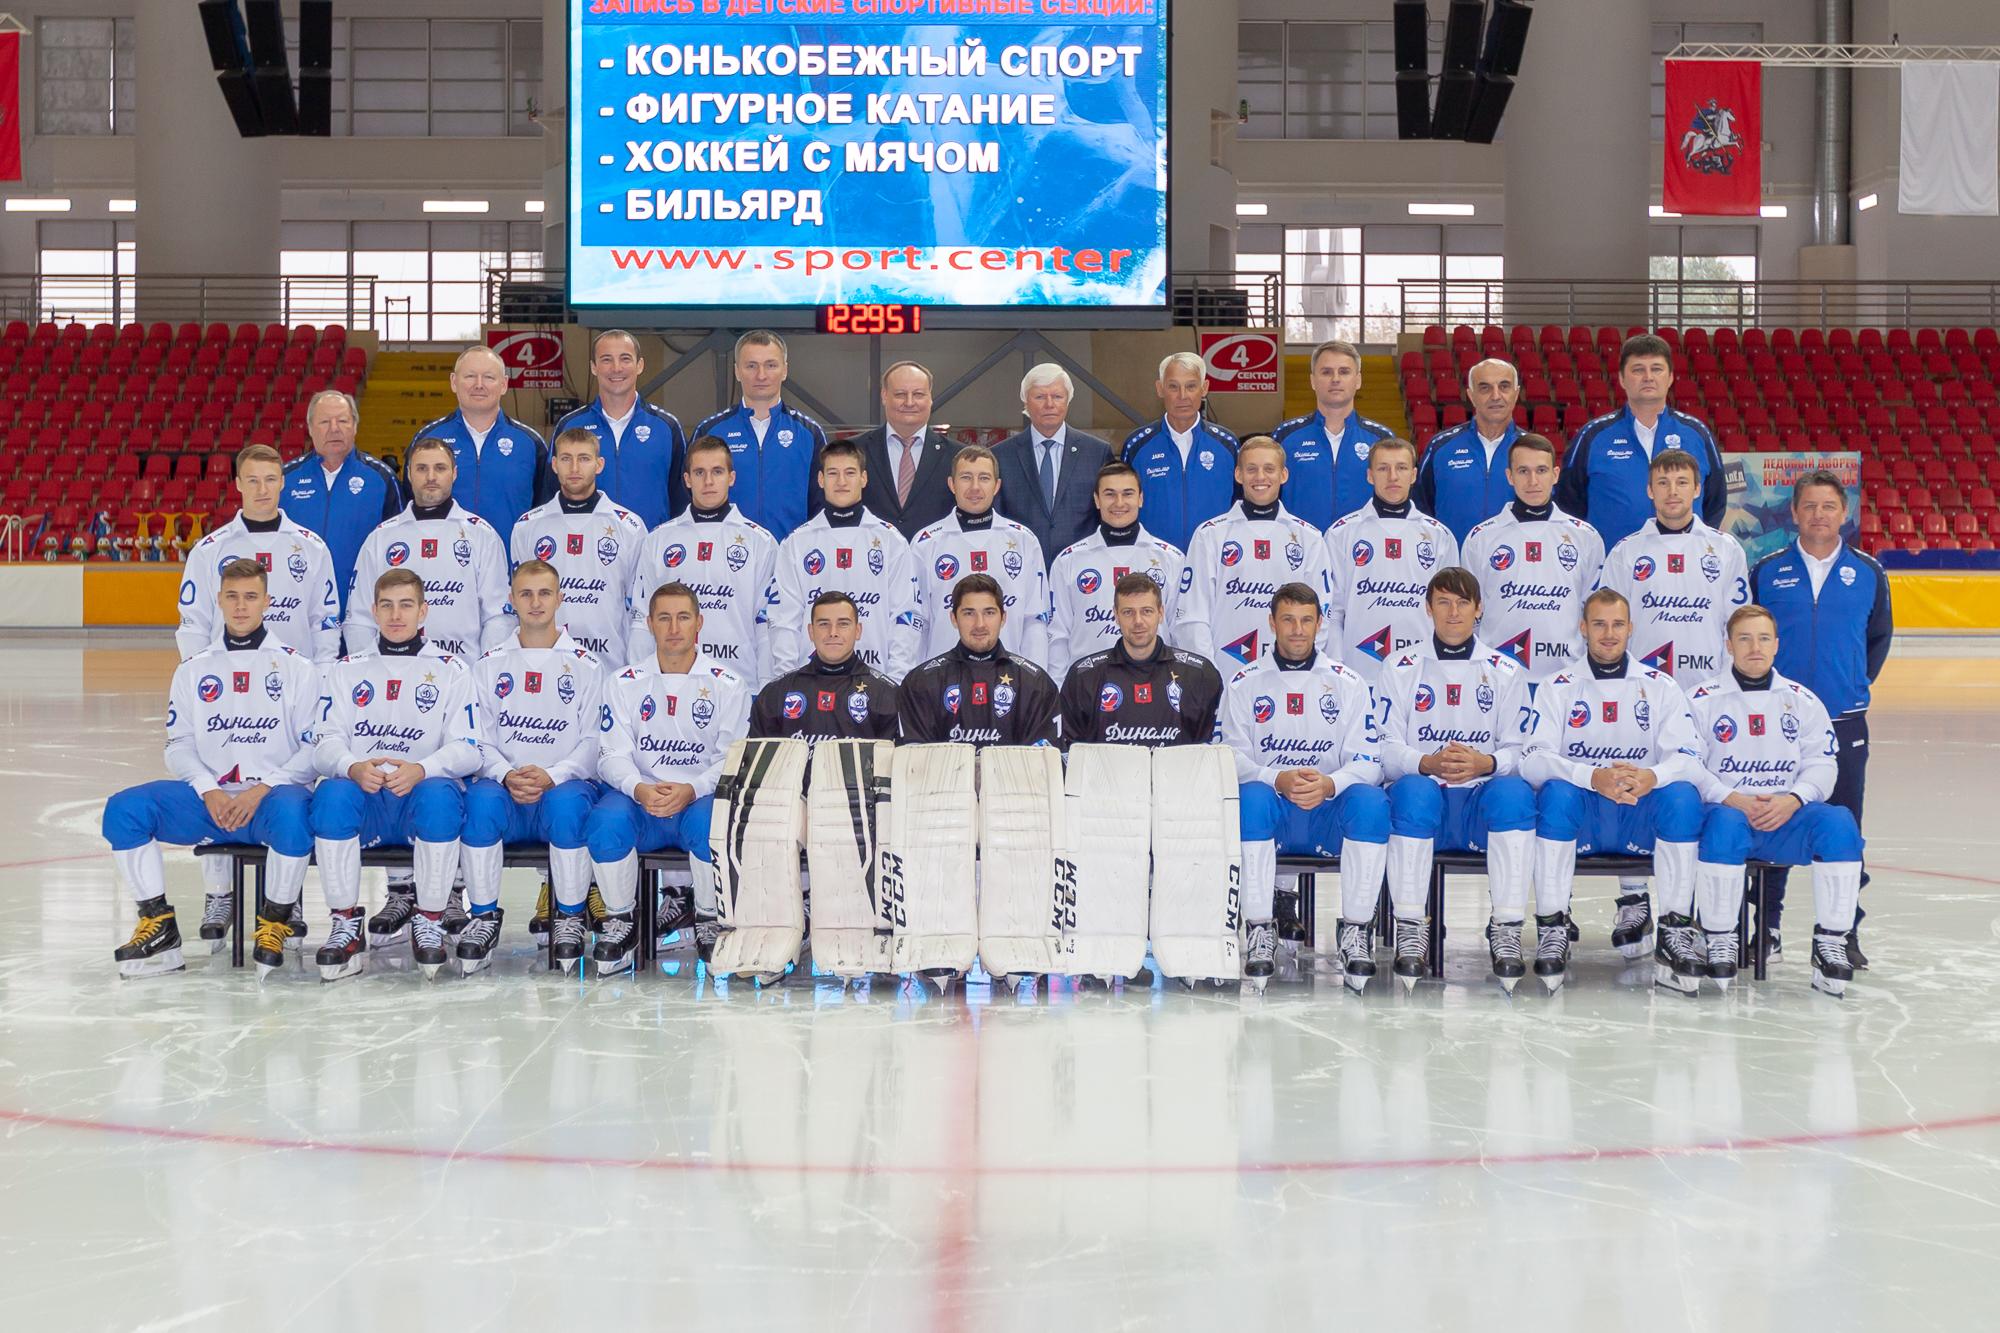 Сезон 2019/2020 (перед началом сезона)